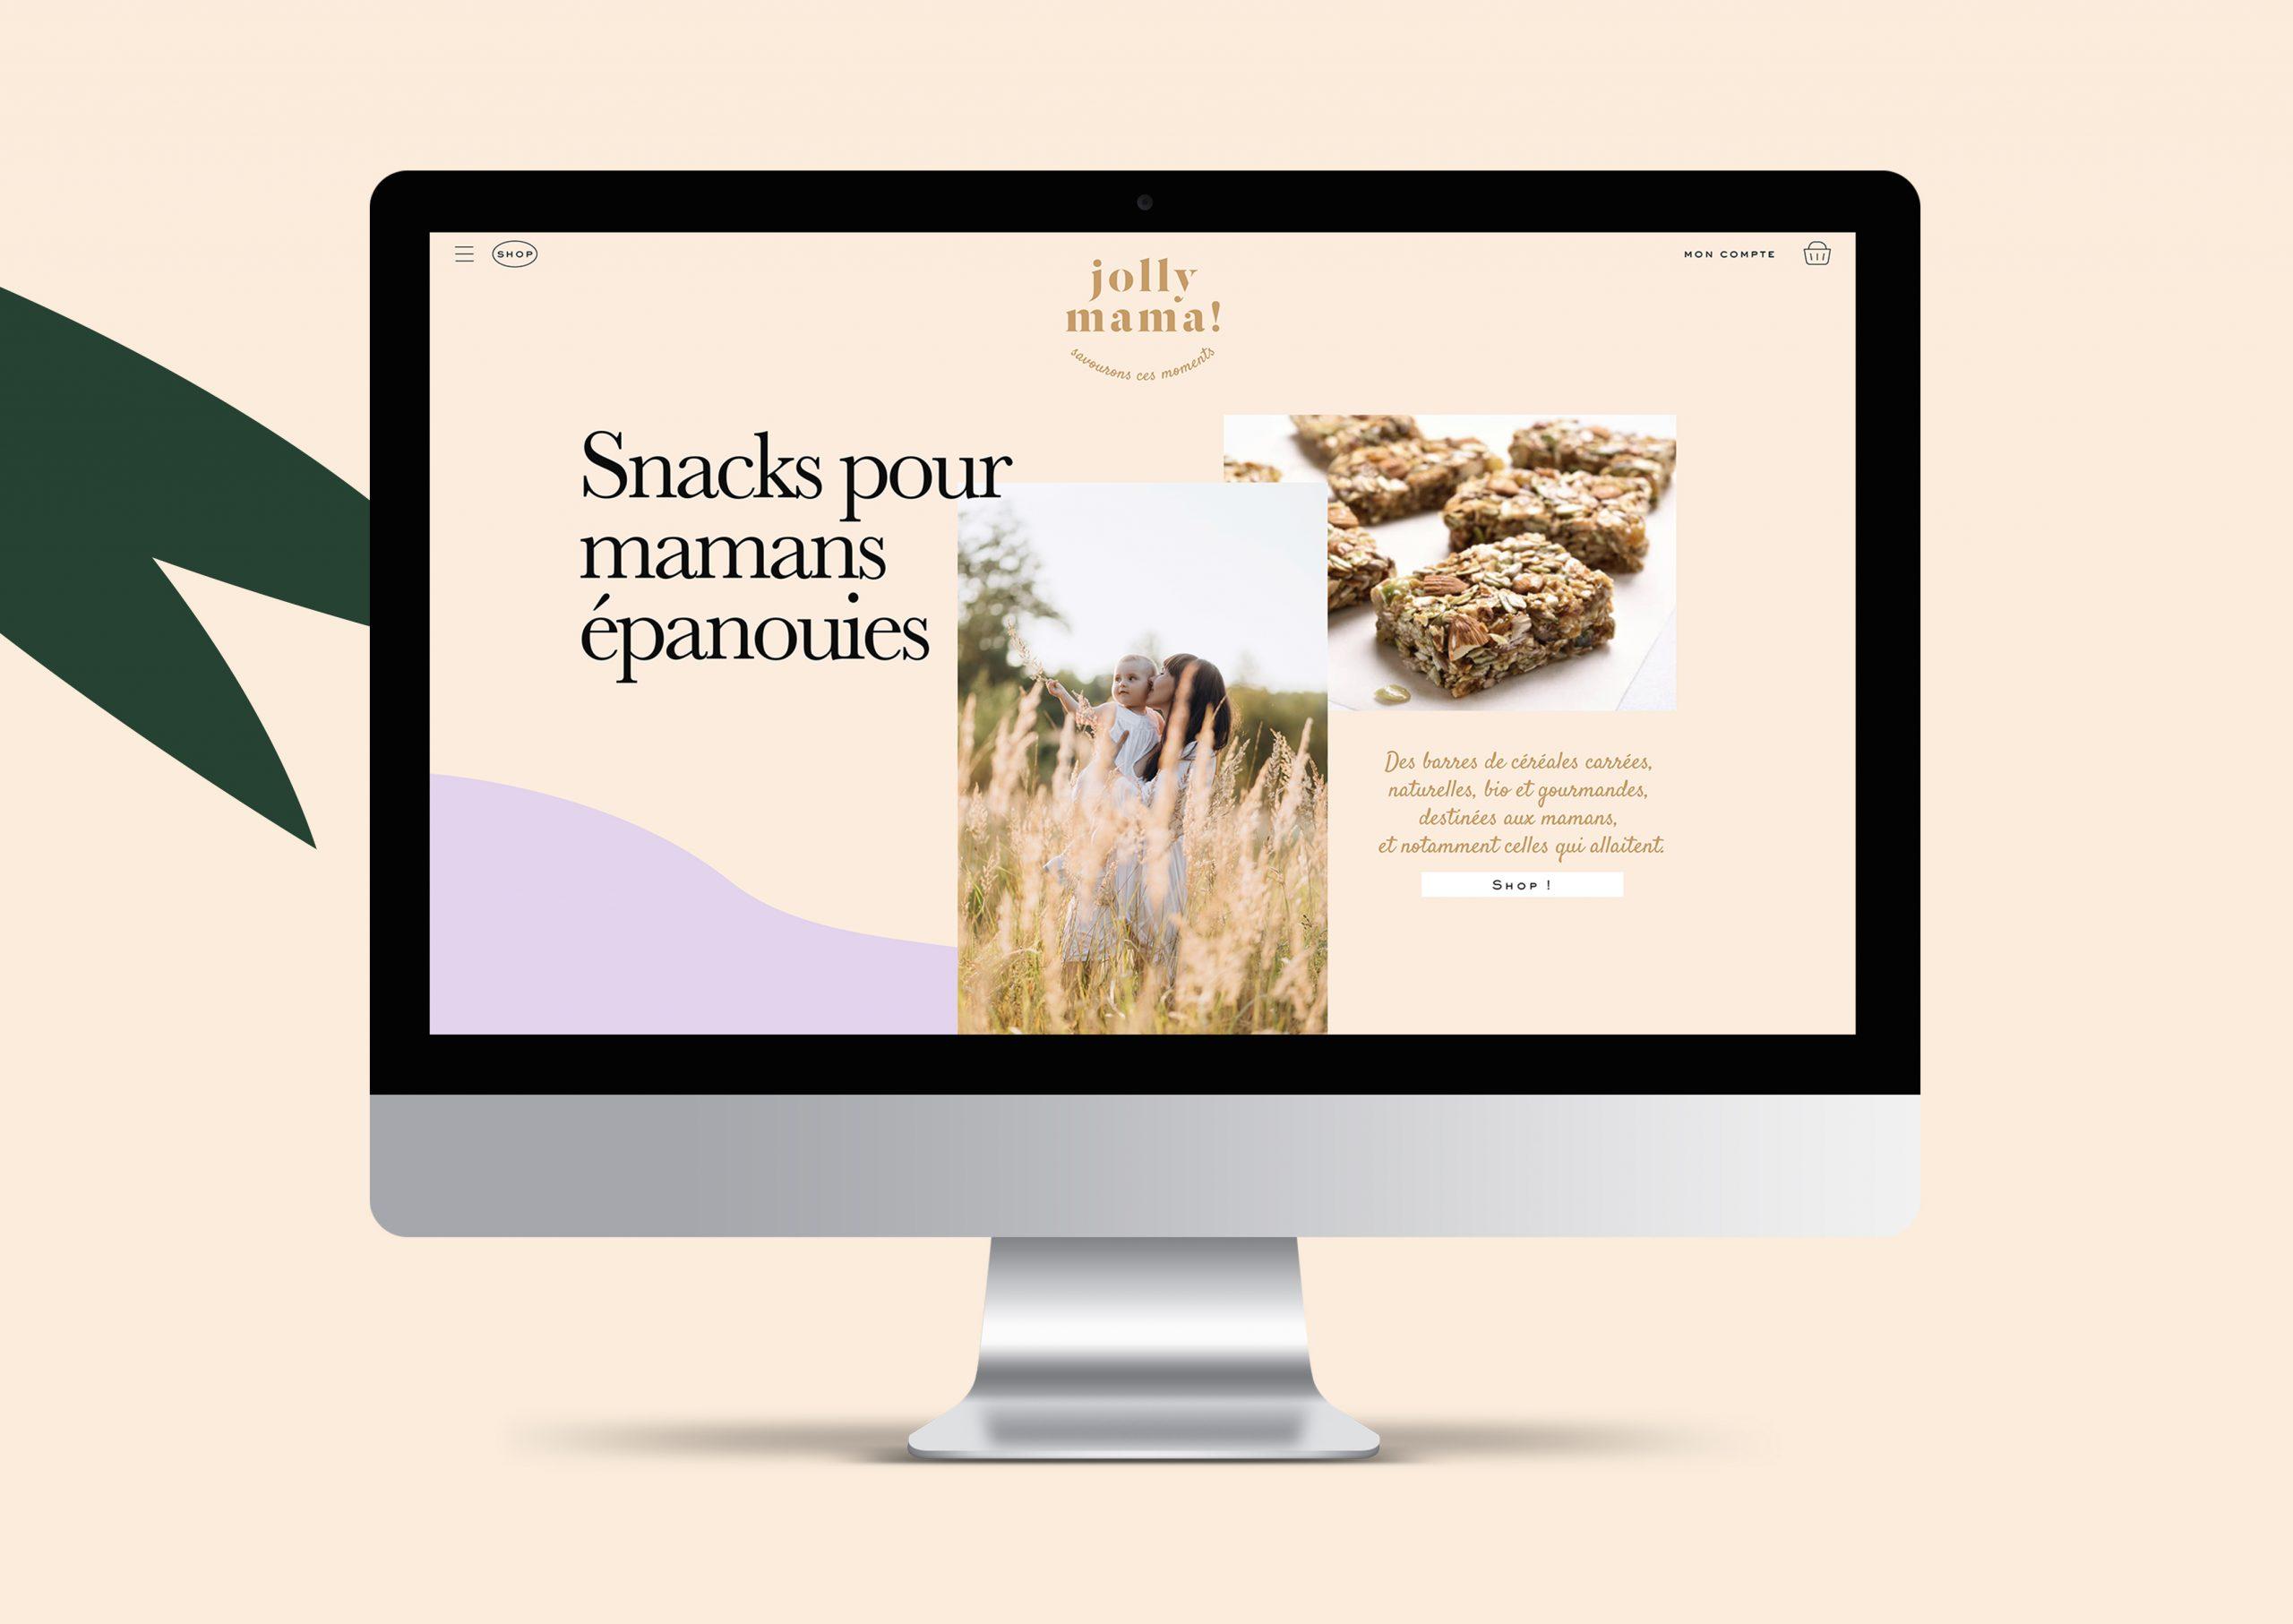 snack pour mamans épanouies site Jolly Mama